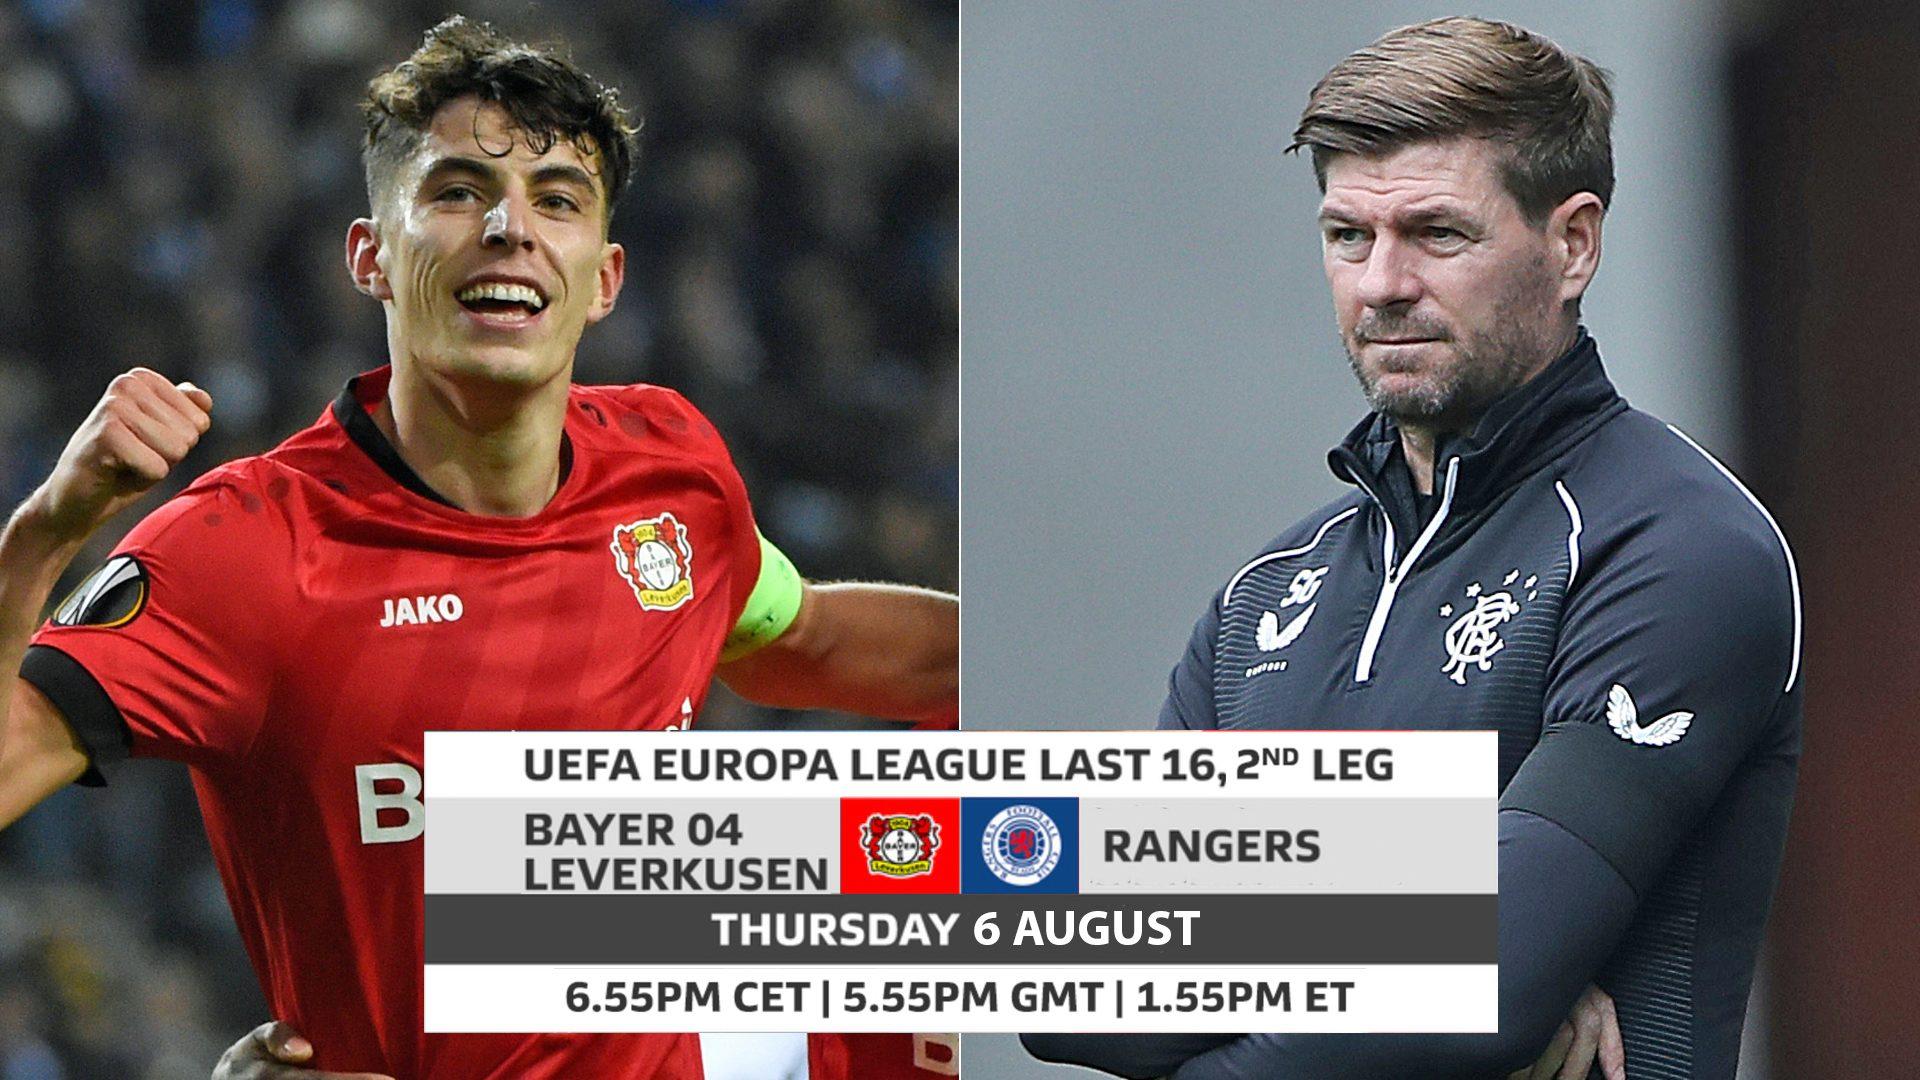 Xem lại bóng đá Leverkusen vs Glasgow Rangers, Europa League – 08/08/2020